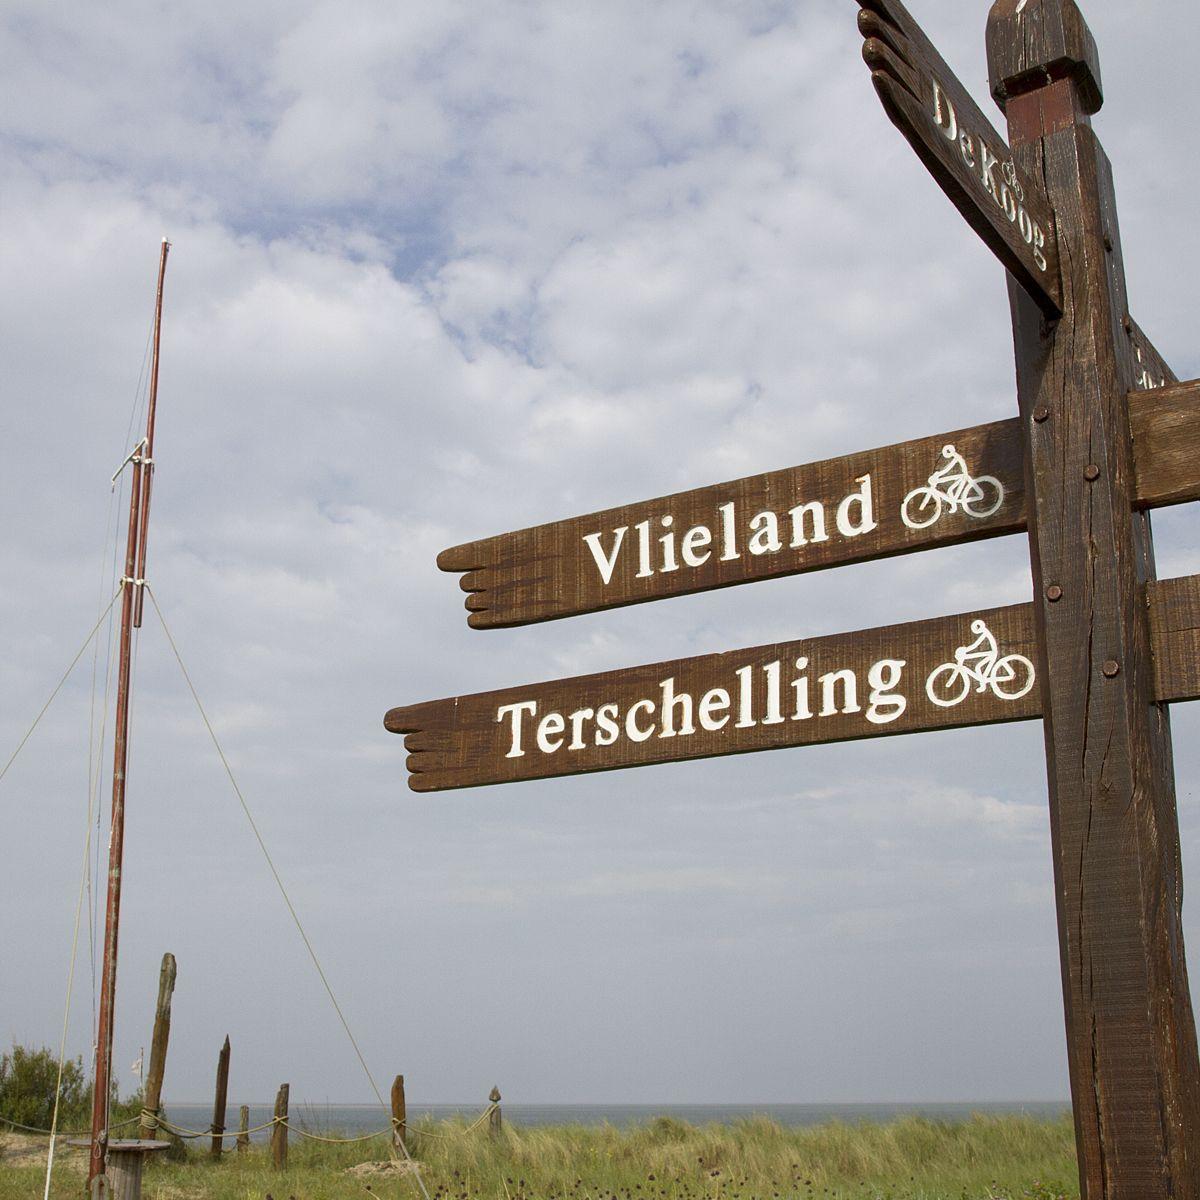 Eilandhoppen tussen Texel en Vlieland